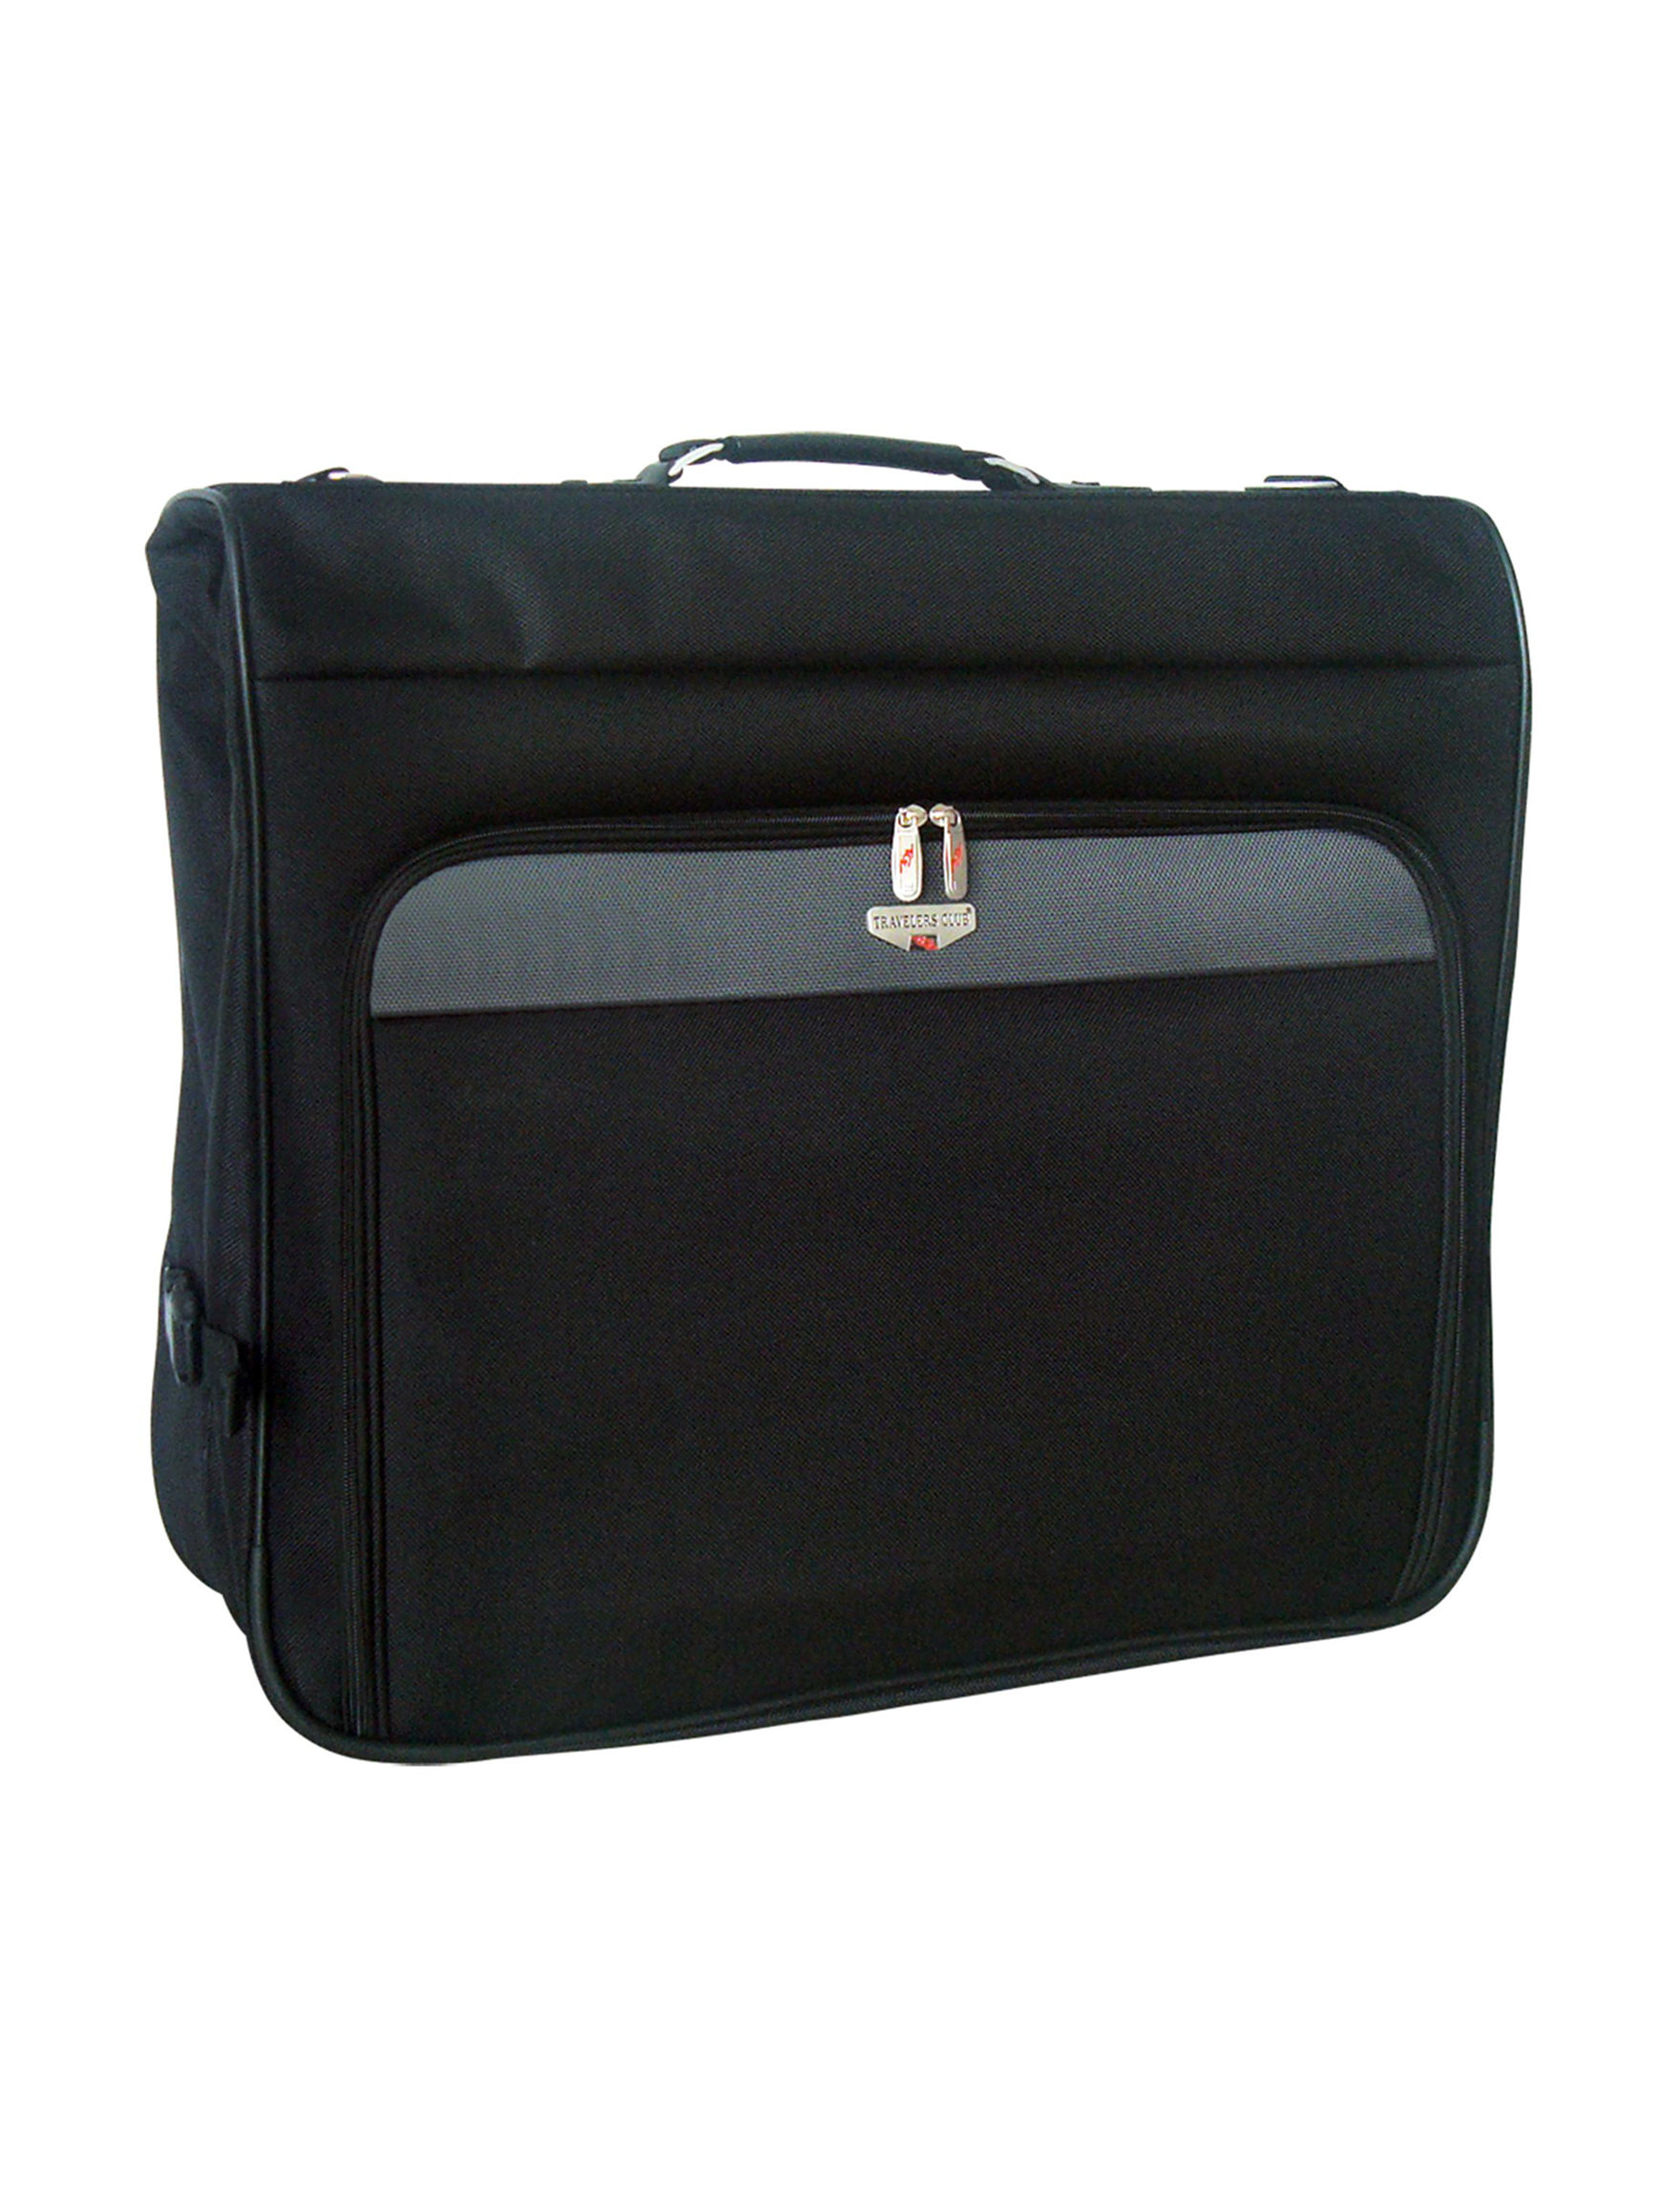 Travelers Club Luggage Oxford Garment Bags